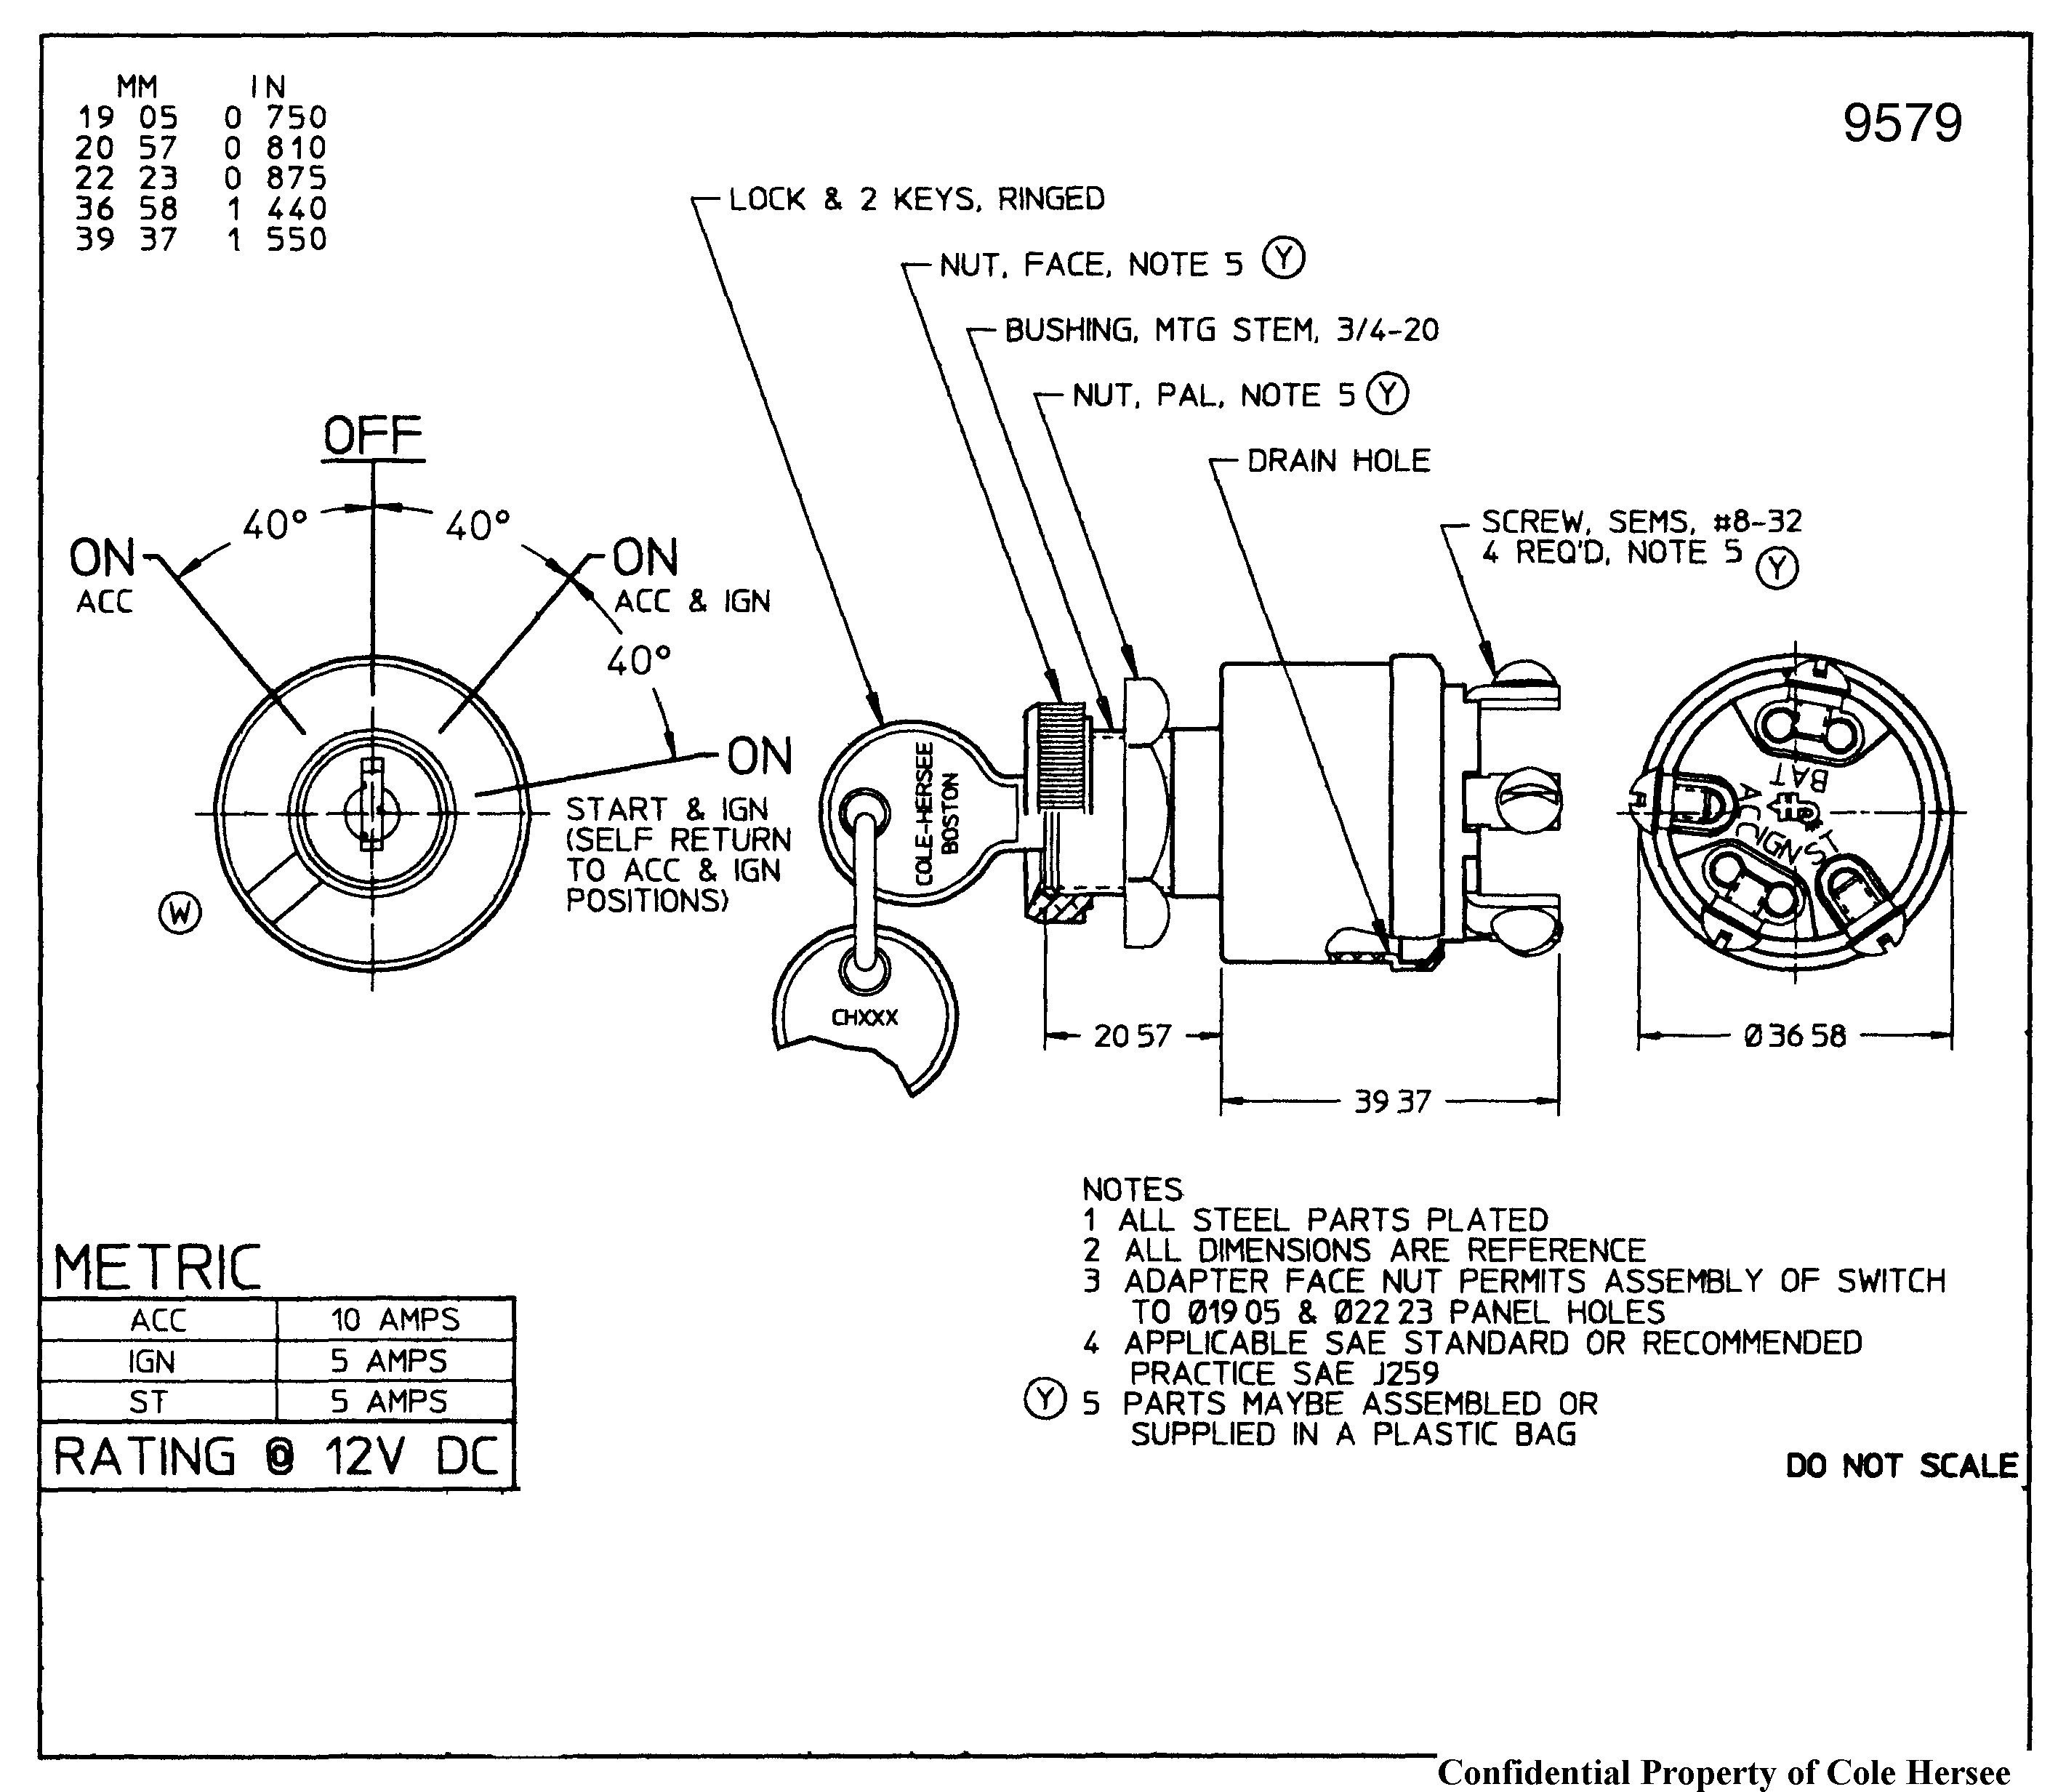 Universal Key Switch Wiring Diagram | Wiring Diagram - 3 Position Ignition Switch Wiring Diagram